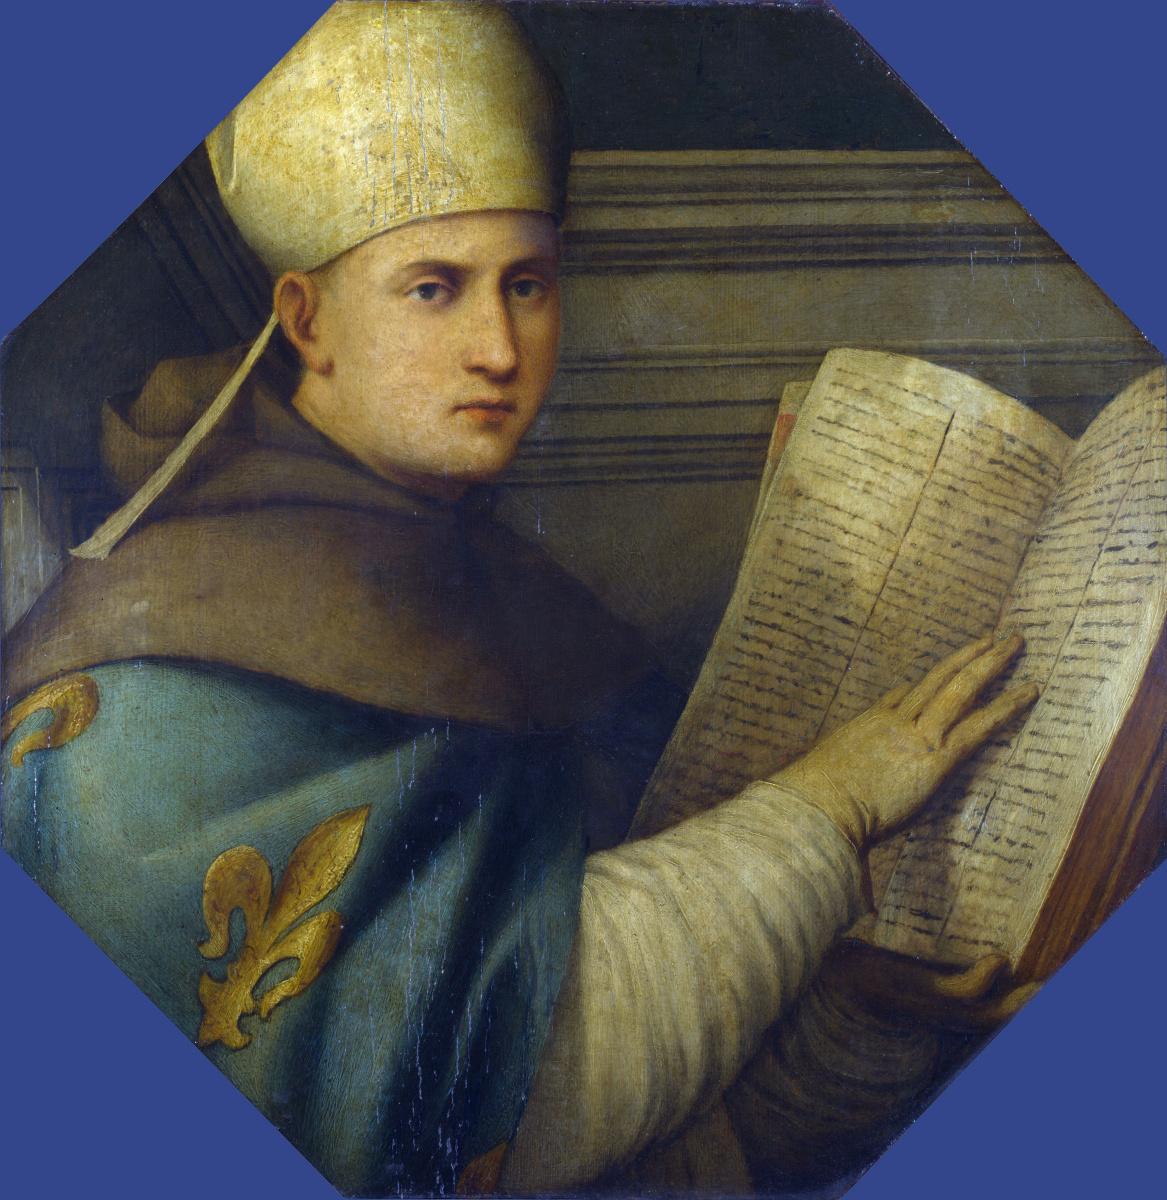 Джованни Антонио де Лодесанис Порденоне. Святой Луиз Тулузский